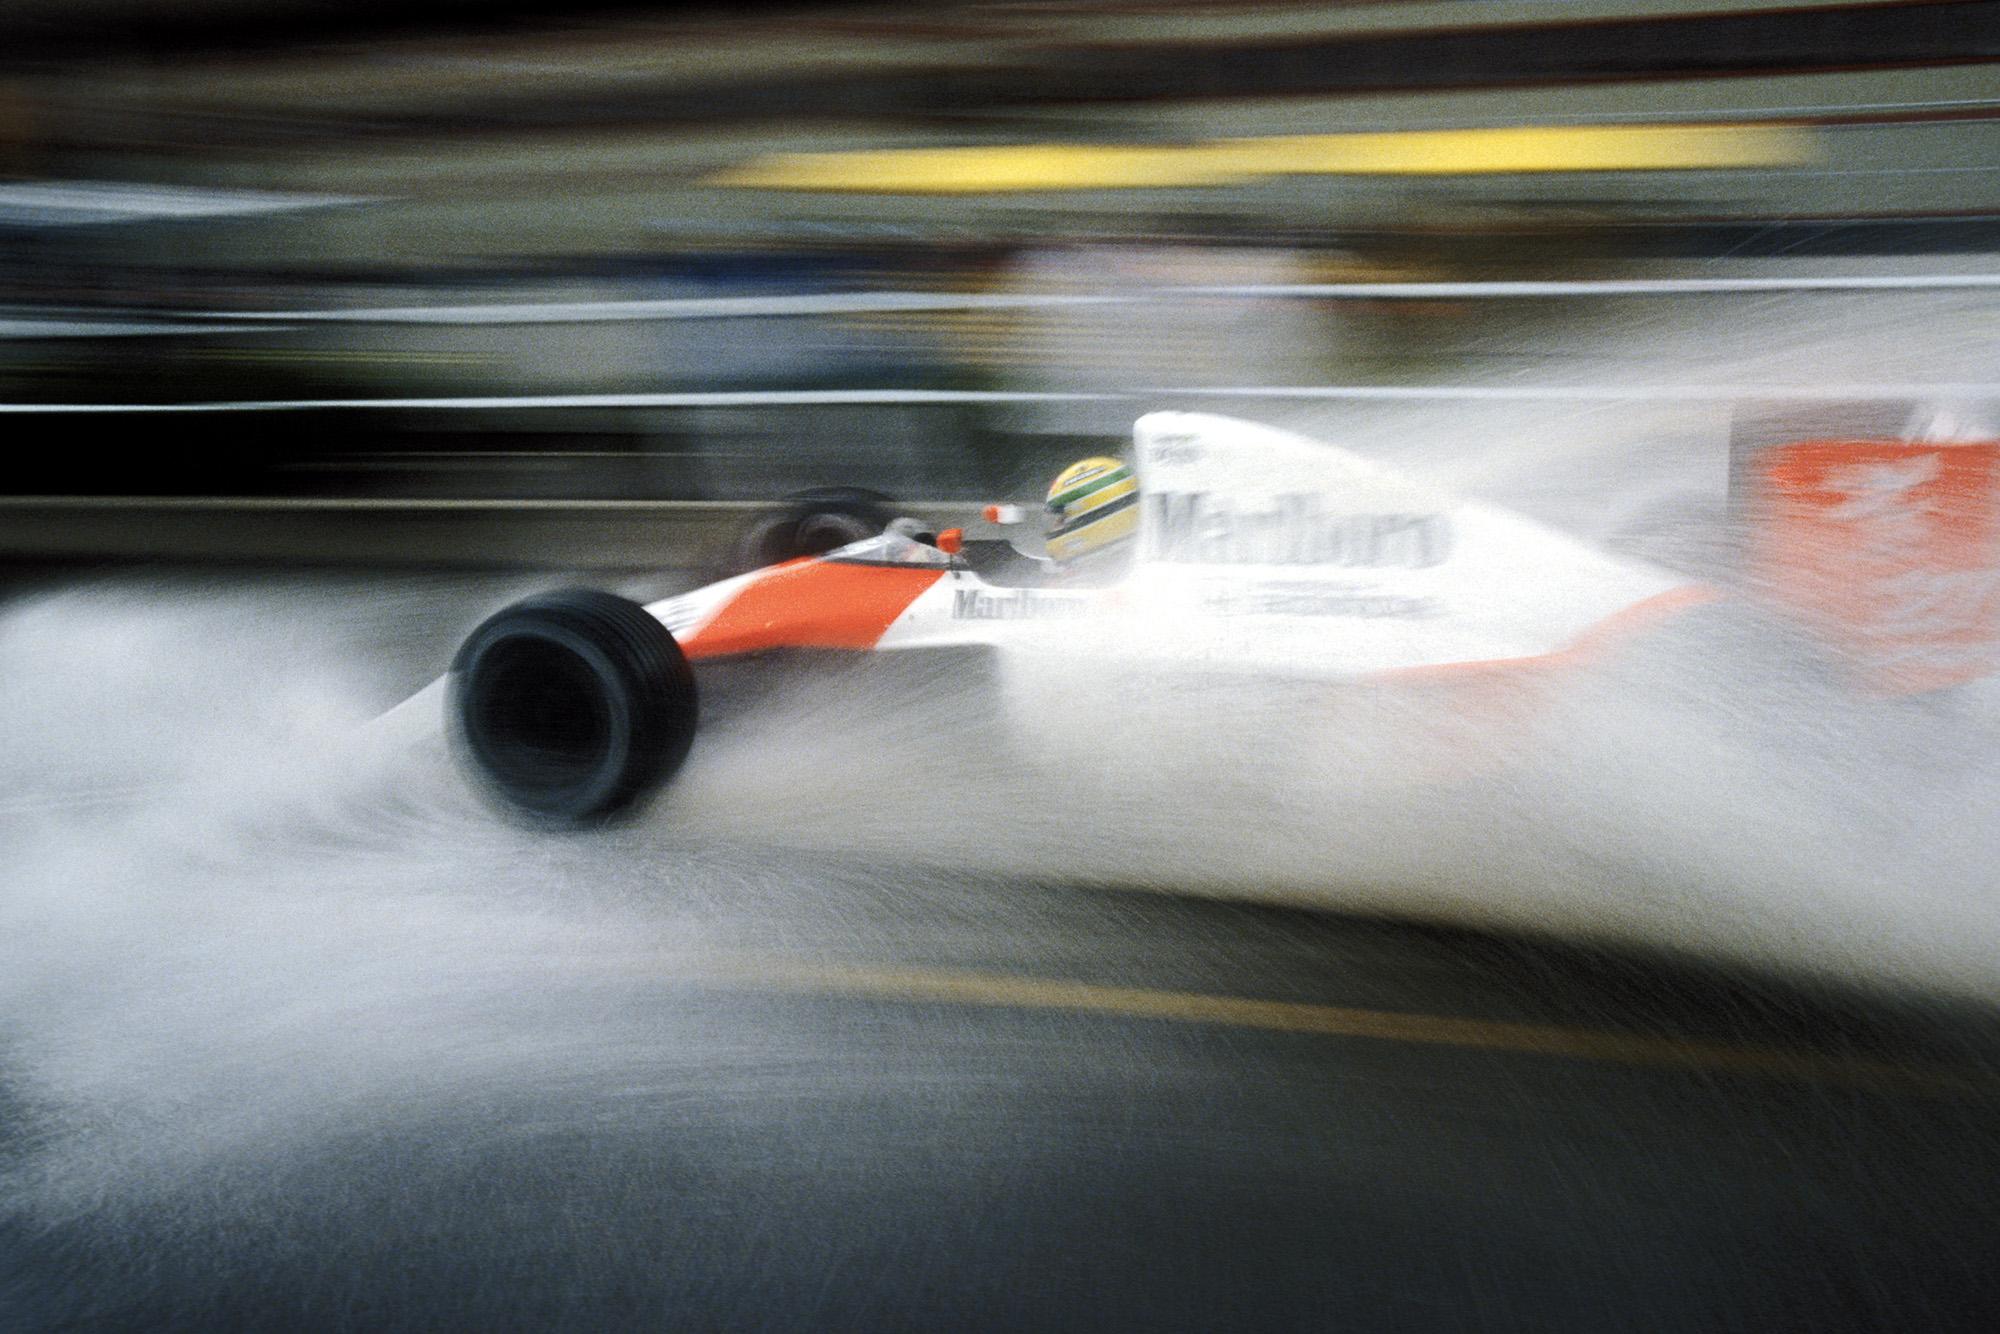 Ayrton Senna in the rain at the 1990 US Grand Prix in Phoenix